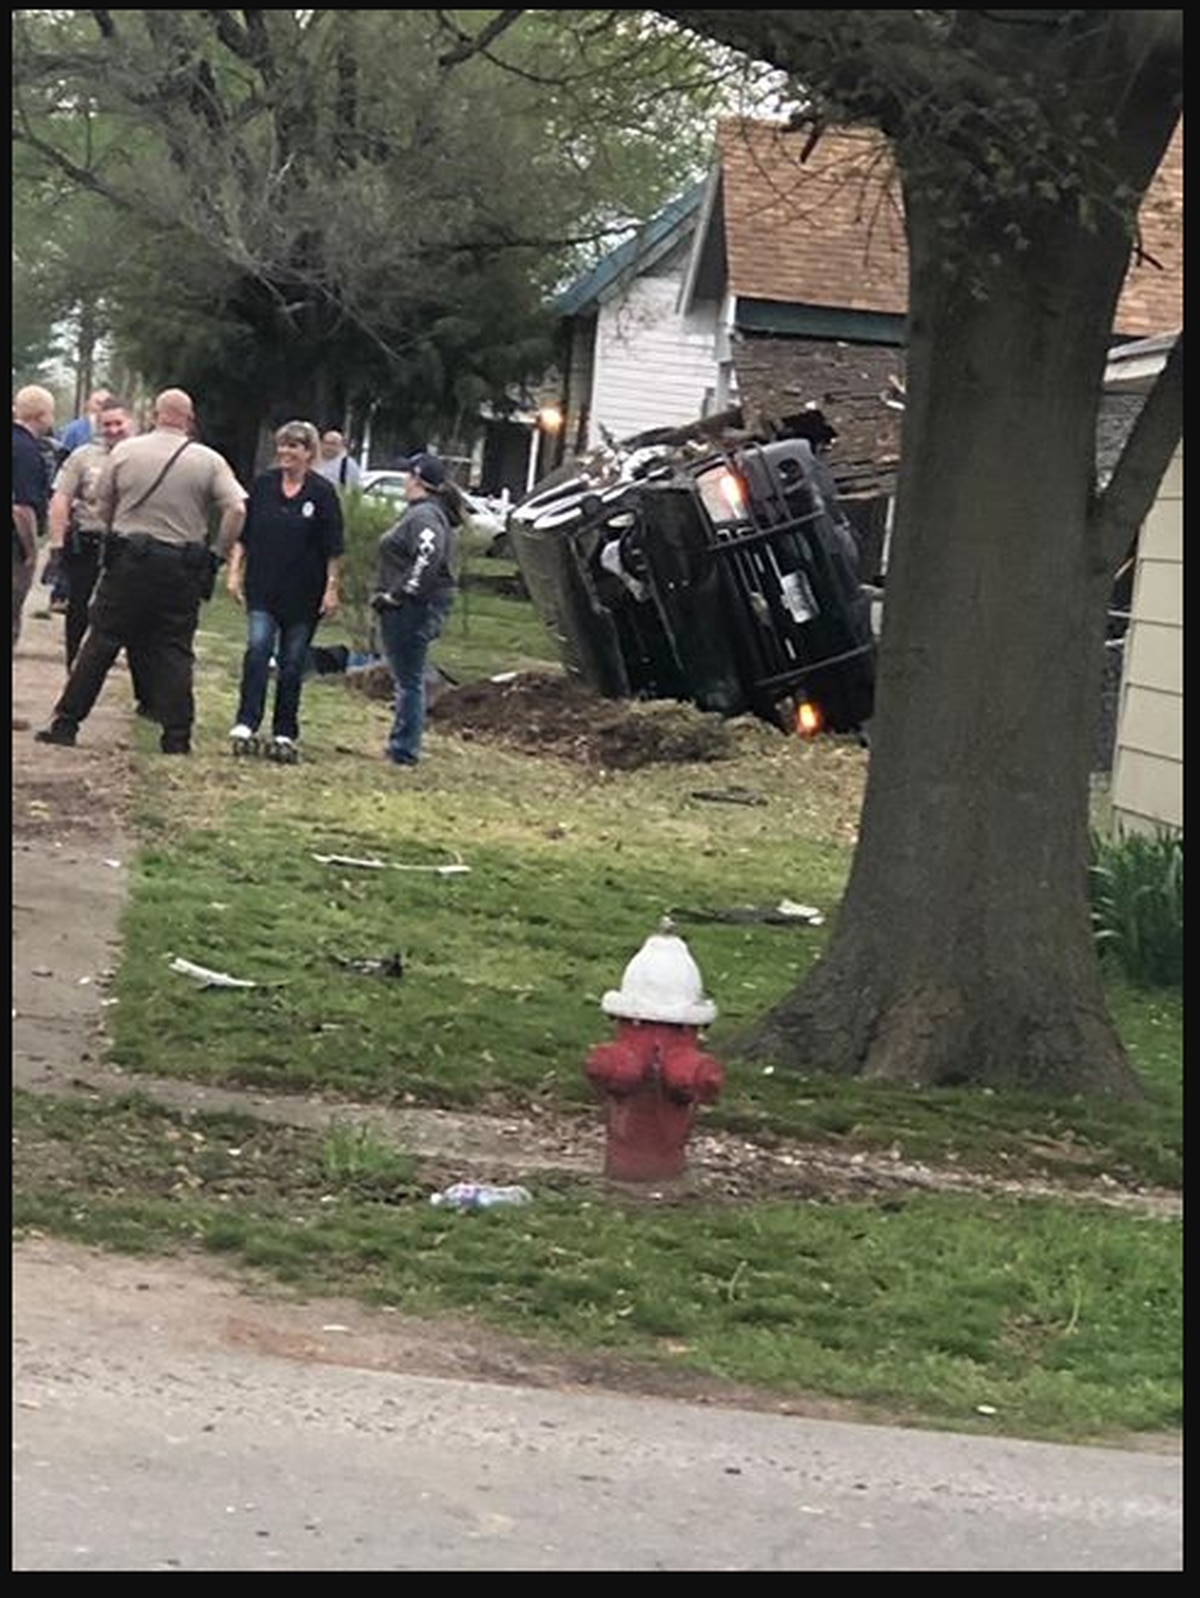 Bernie officer involved in car crash